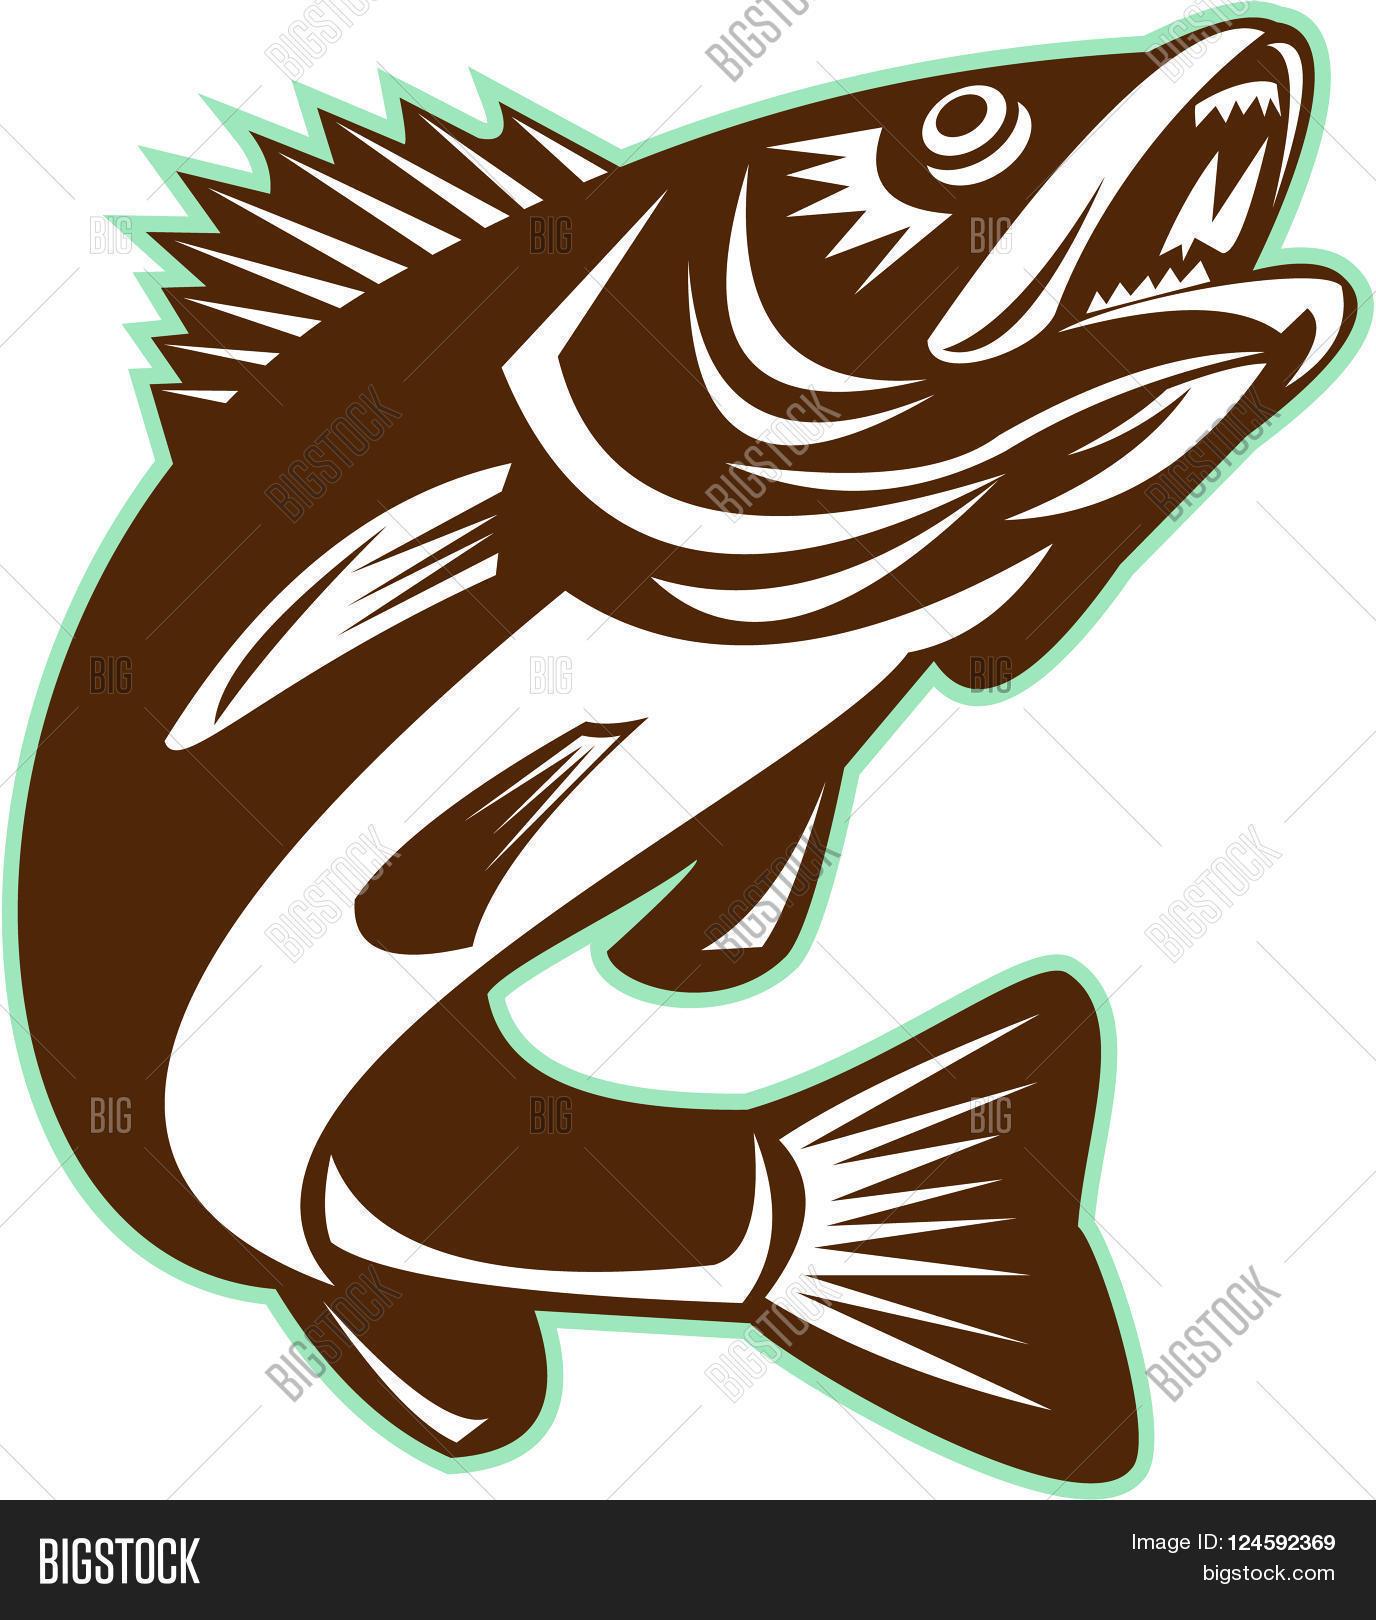 Freshwater fish jumping - Illustration Of A Walleye Sander Vitreus Formerly Stizostedion Vitreum A Freshwater Perciform Fish Jumping